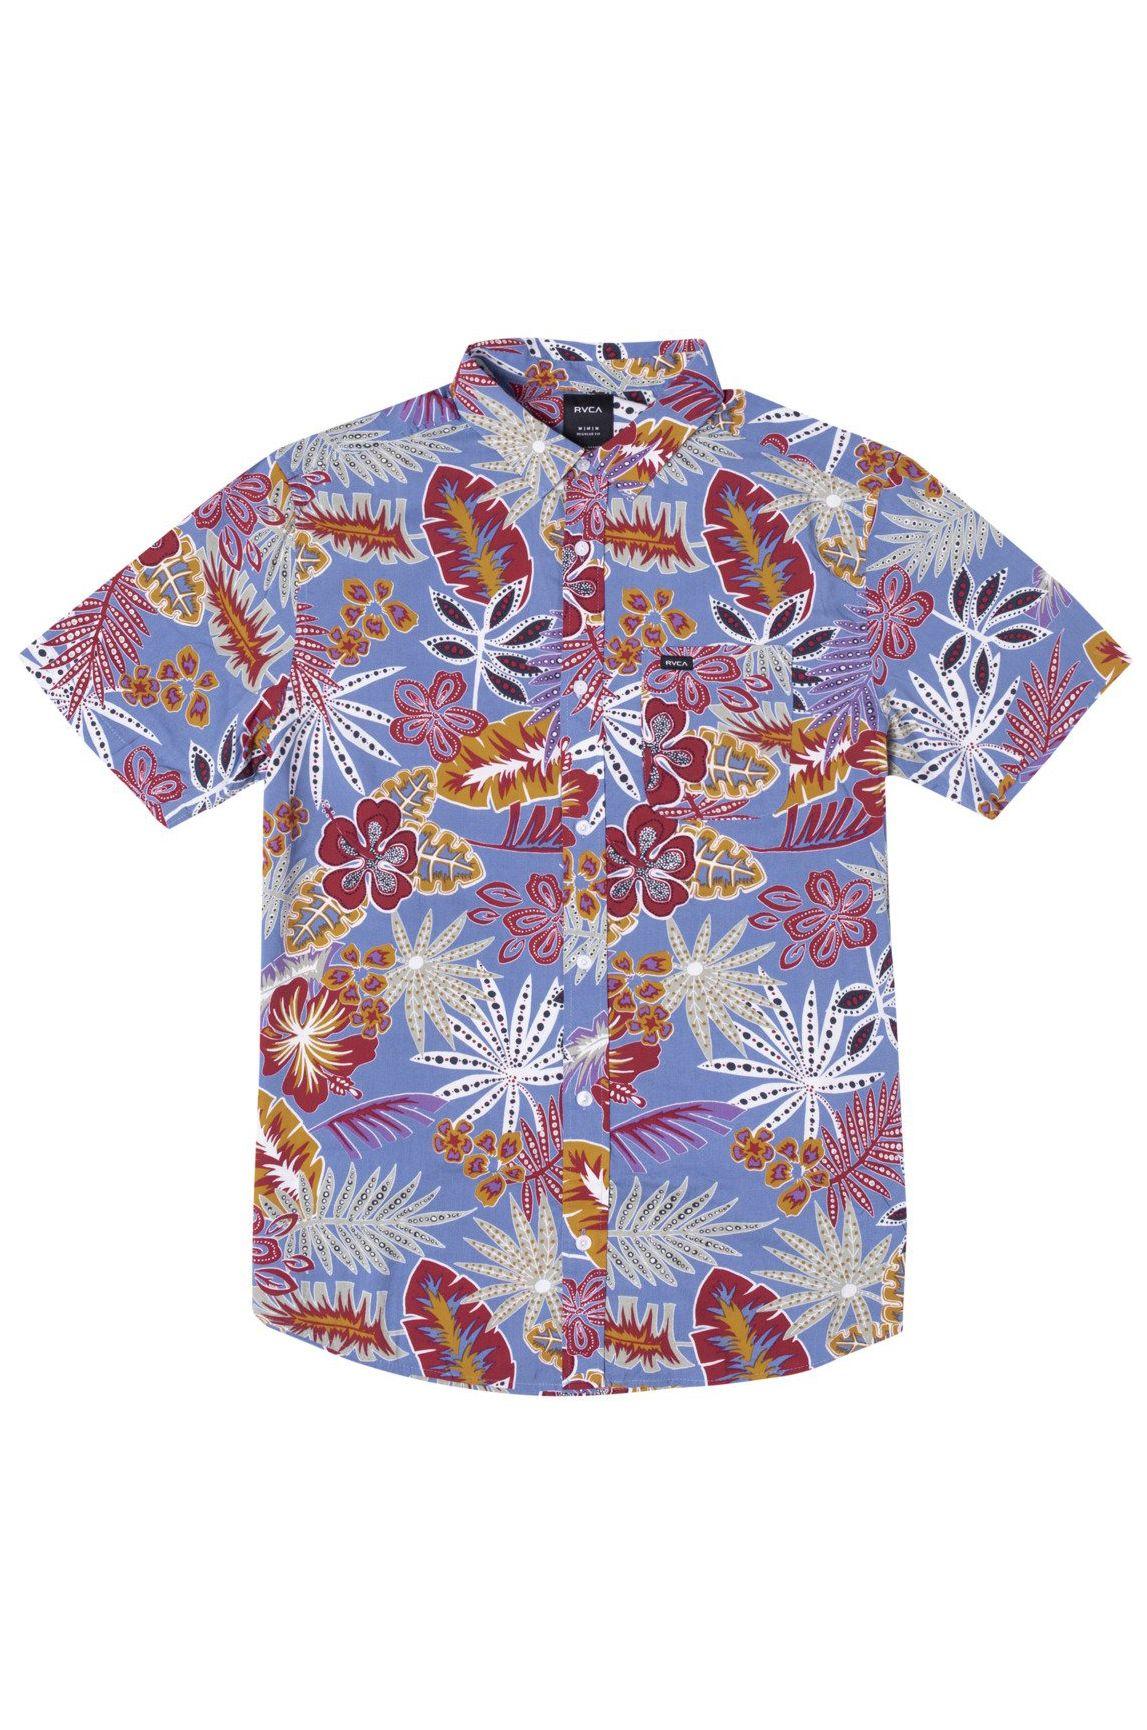 Camisa RVCA SINGAPORE SLING FLOR Floral